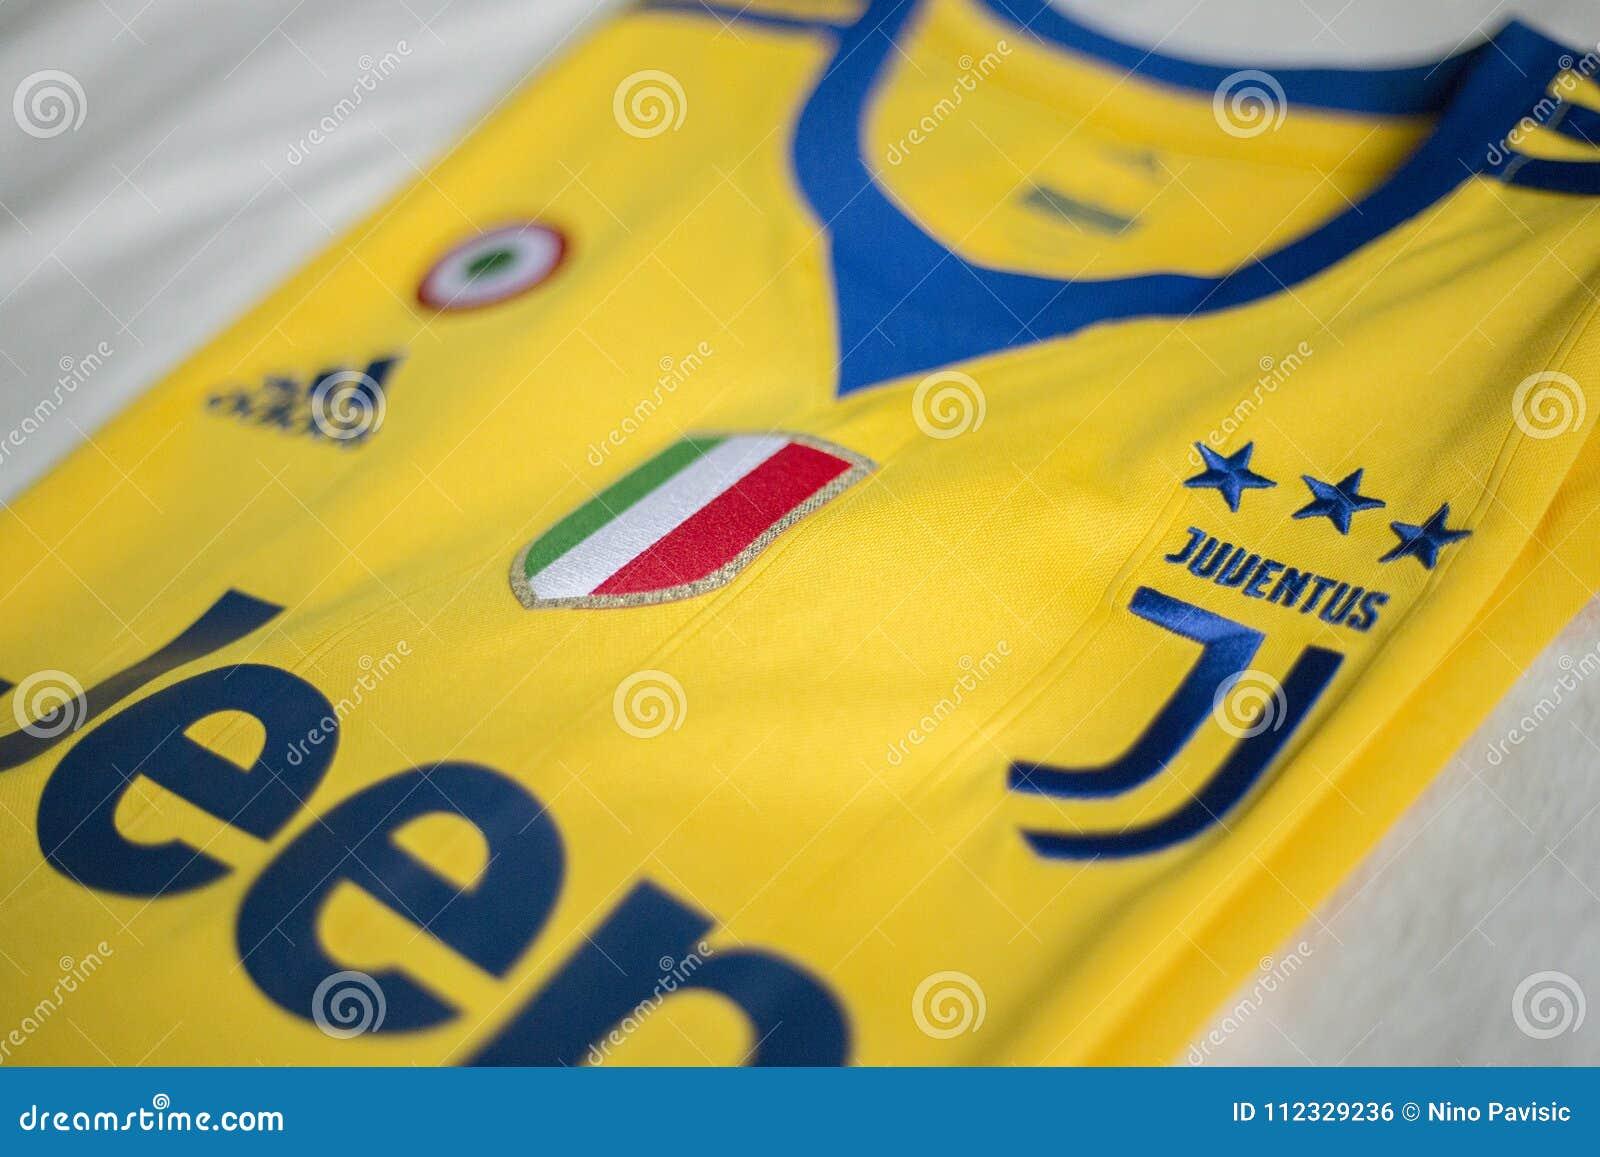 Italian Football Club Fc Juventus Turin Jersey Editorial Photo Image Of Logo Turin 112329236